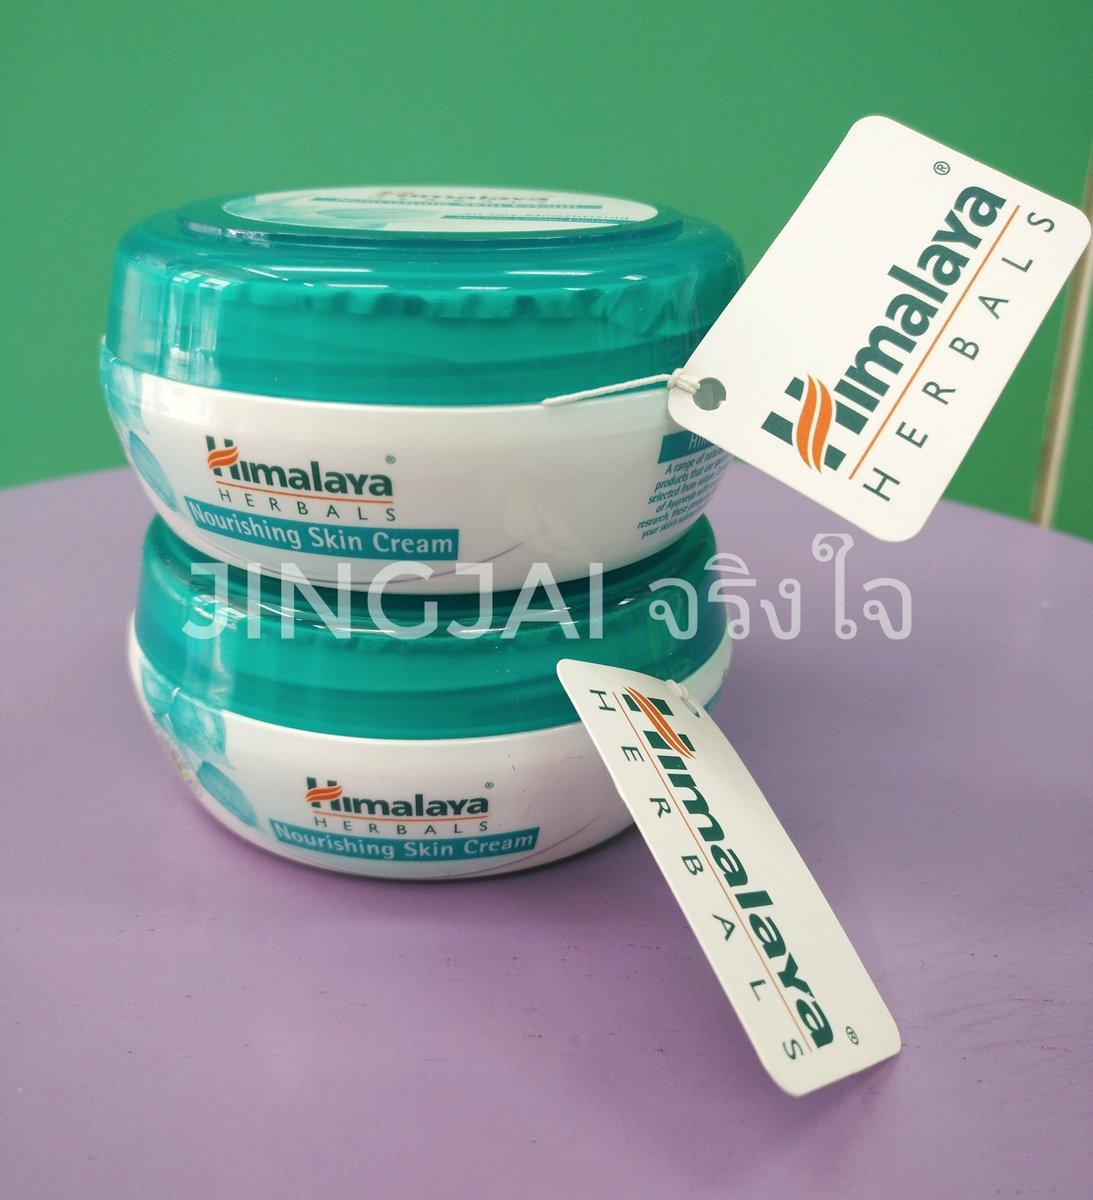 Jingjai Shop On Twitter Himalaya Nourishing Skin Cream 50 Ml 50ml Concept 1 Himalayanourishingskincream Howtoperfectpic